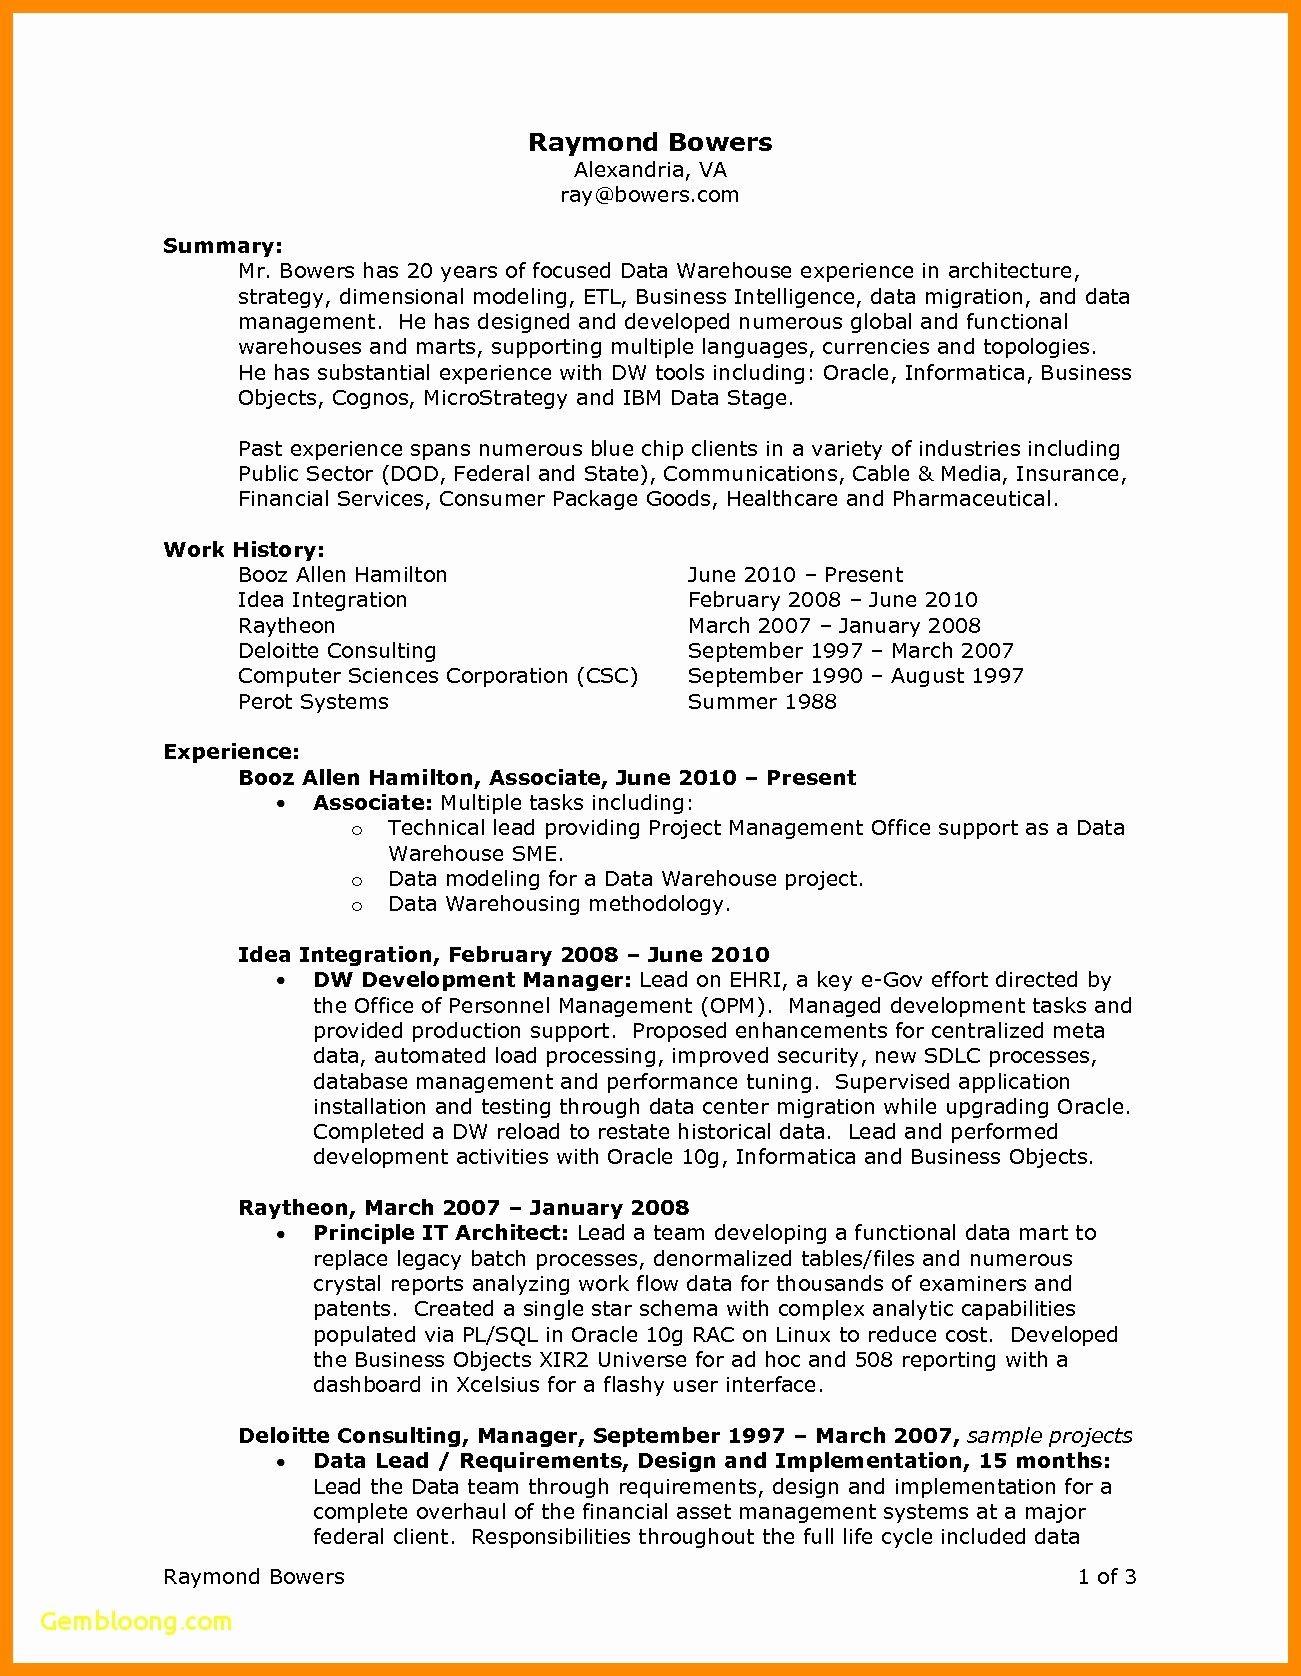 March Calendar Print Out Más Recientemente Liberado Marriage Counseling Worksheets Briefencounters Worksheet Template Of March Calendar Print Out Recientes Monthly Calendar 2015 Template Printable 2016 Calendar Templates